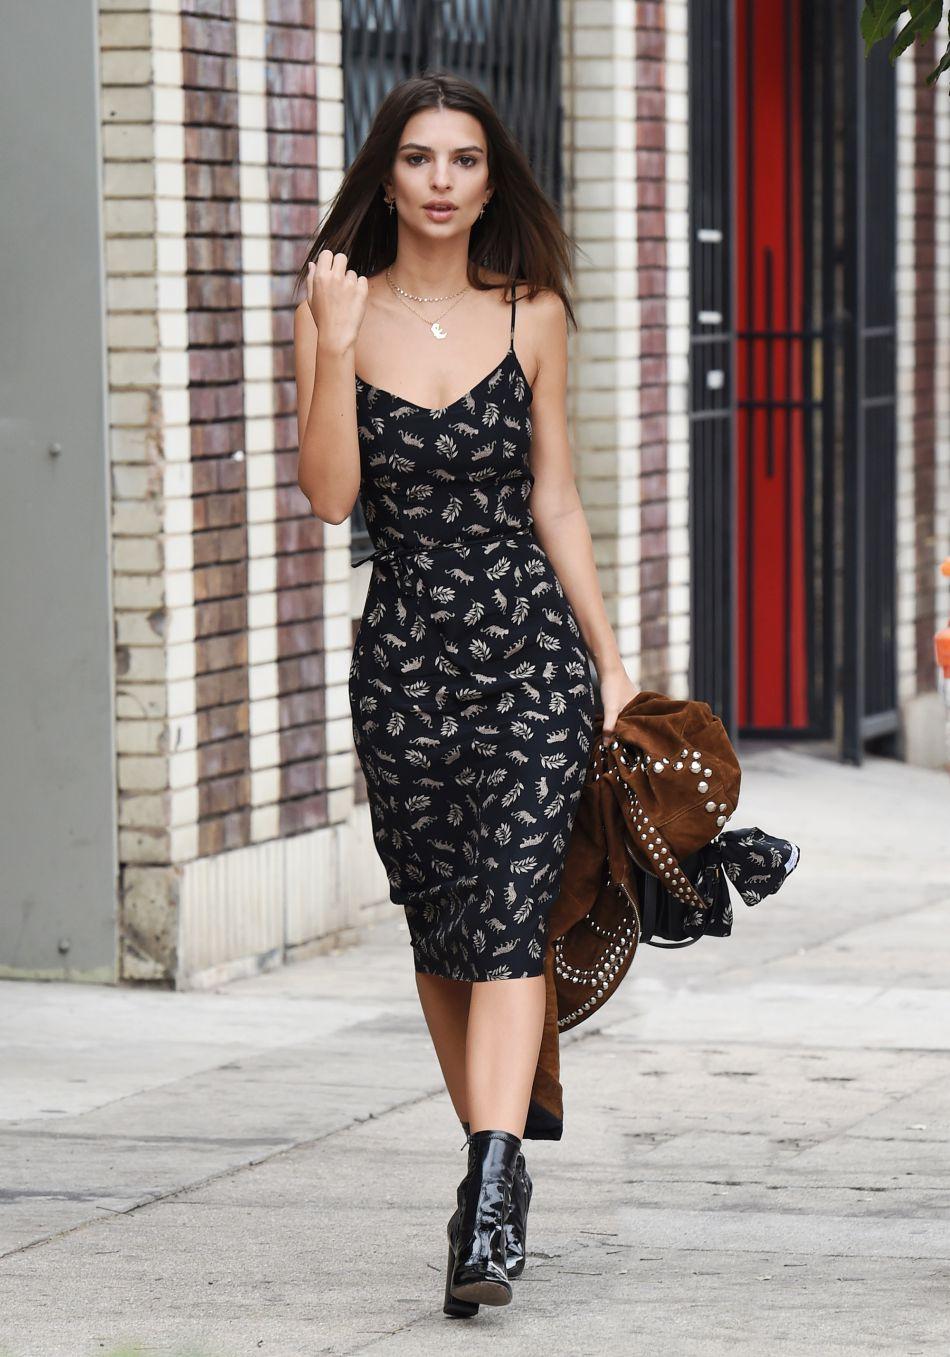 Emily Ratajkowski très sexy dans sa robe fleurie.